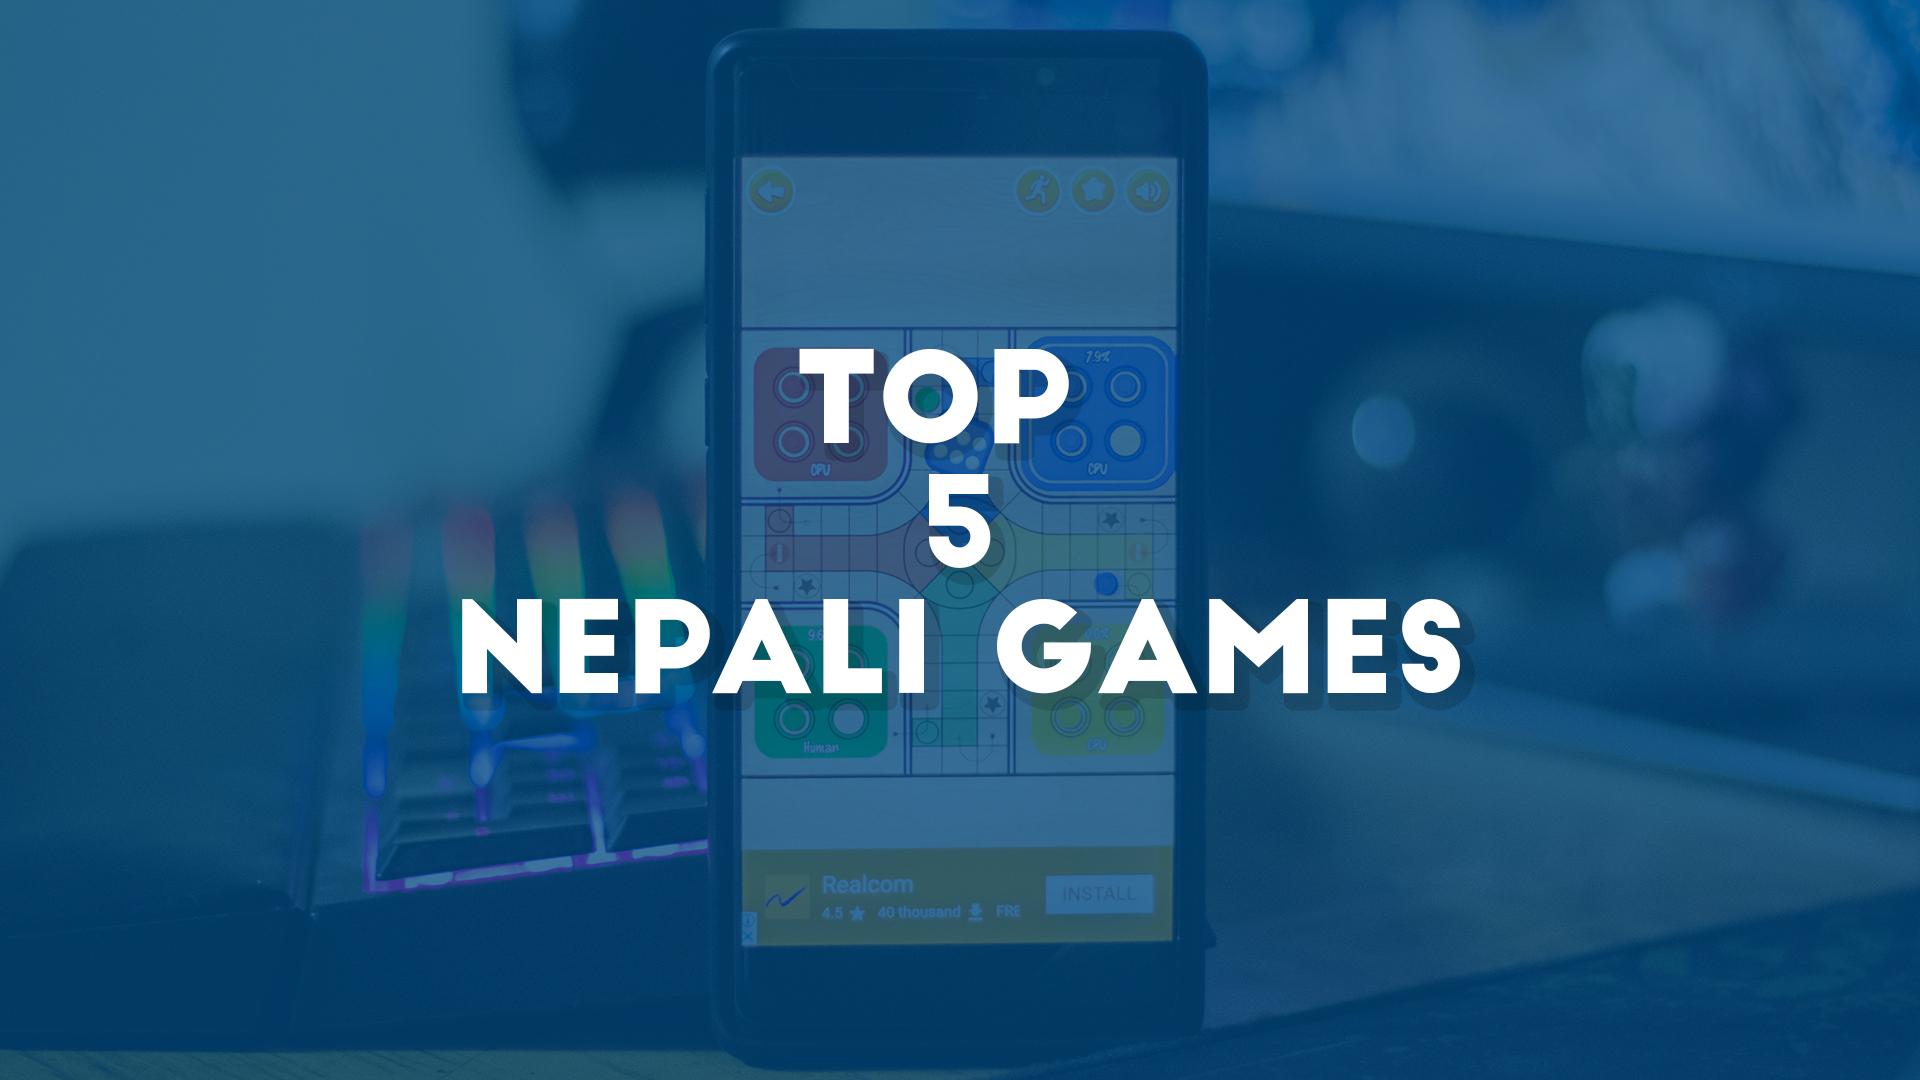 Top 5 Nepali Games